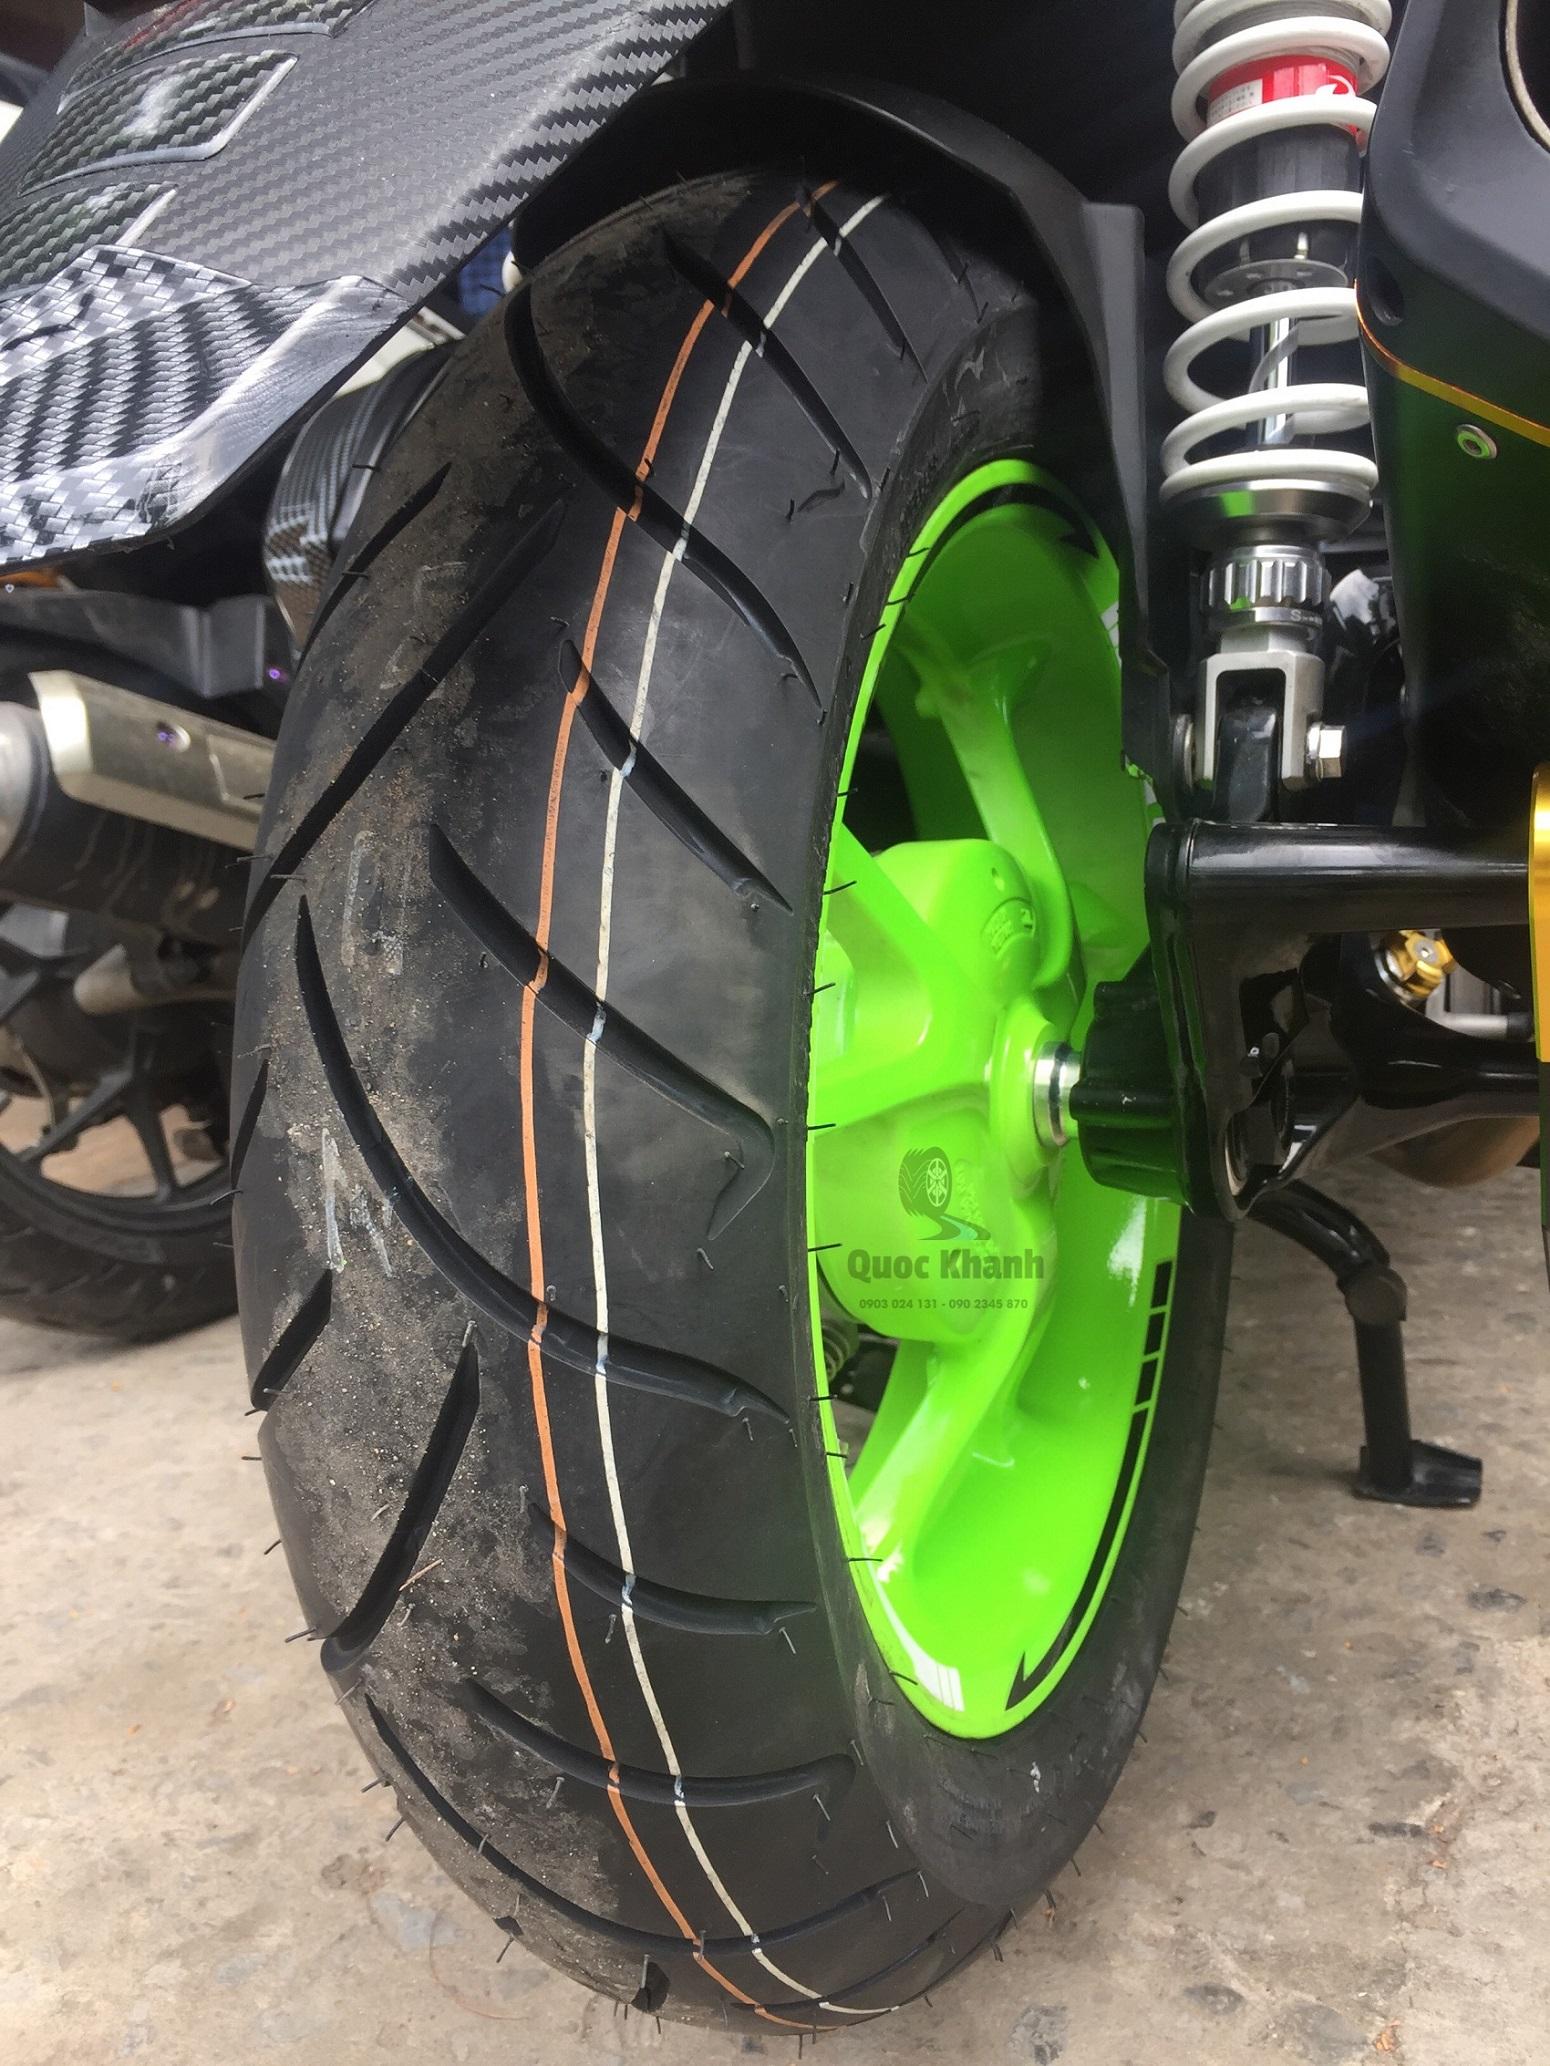 Dunlop 140/70-14 SC TL NVX